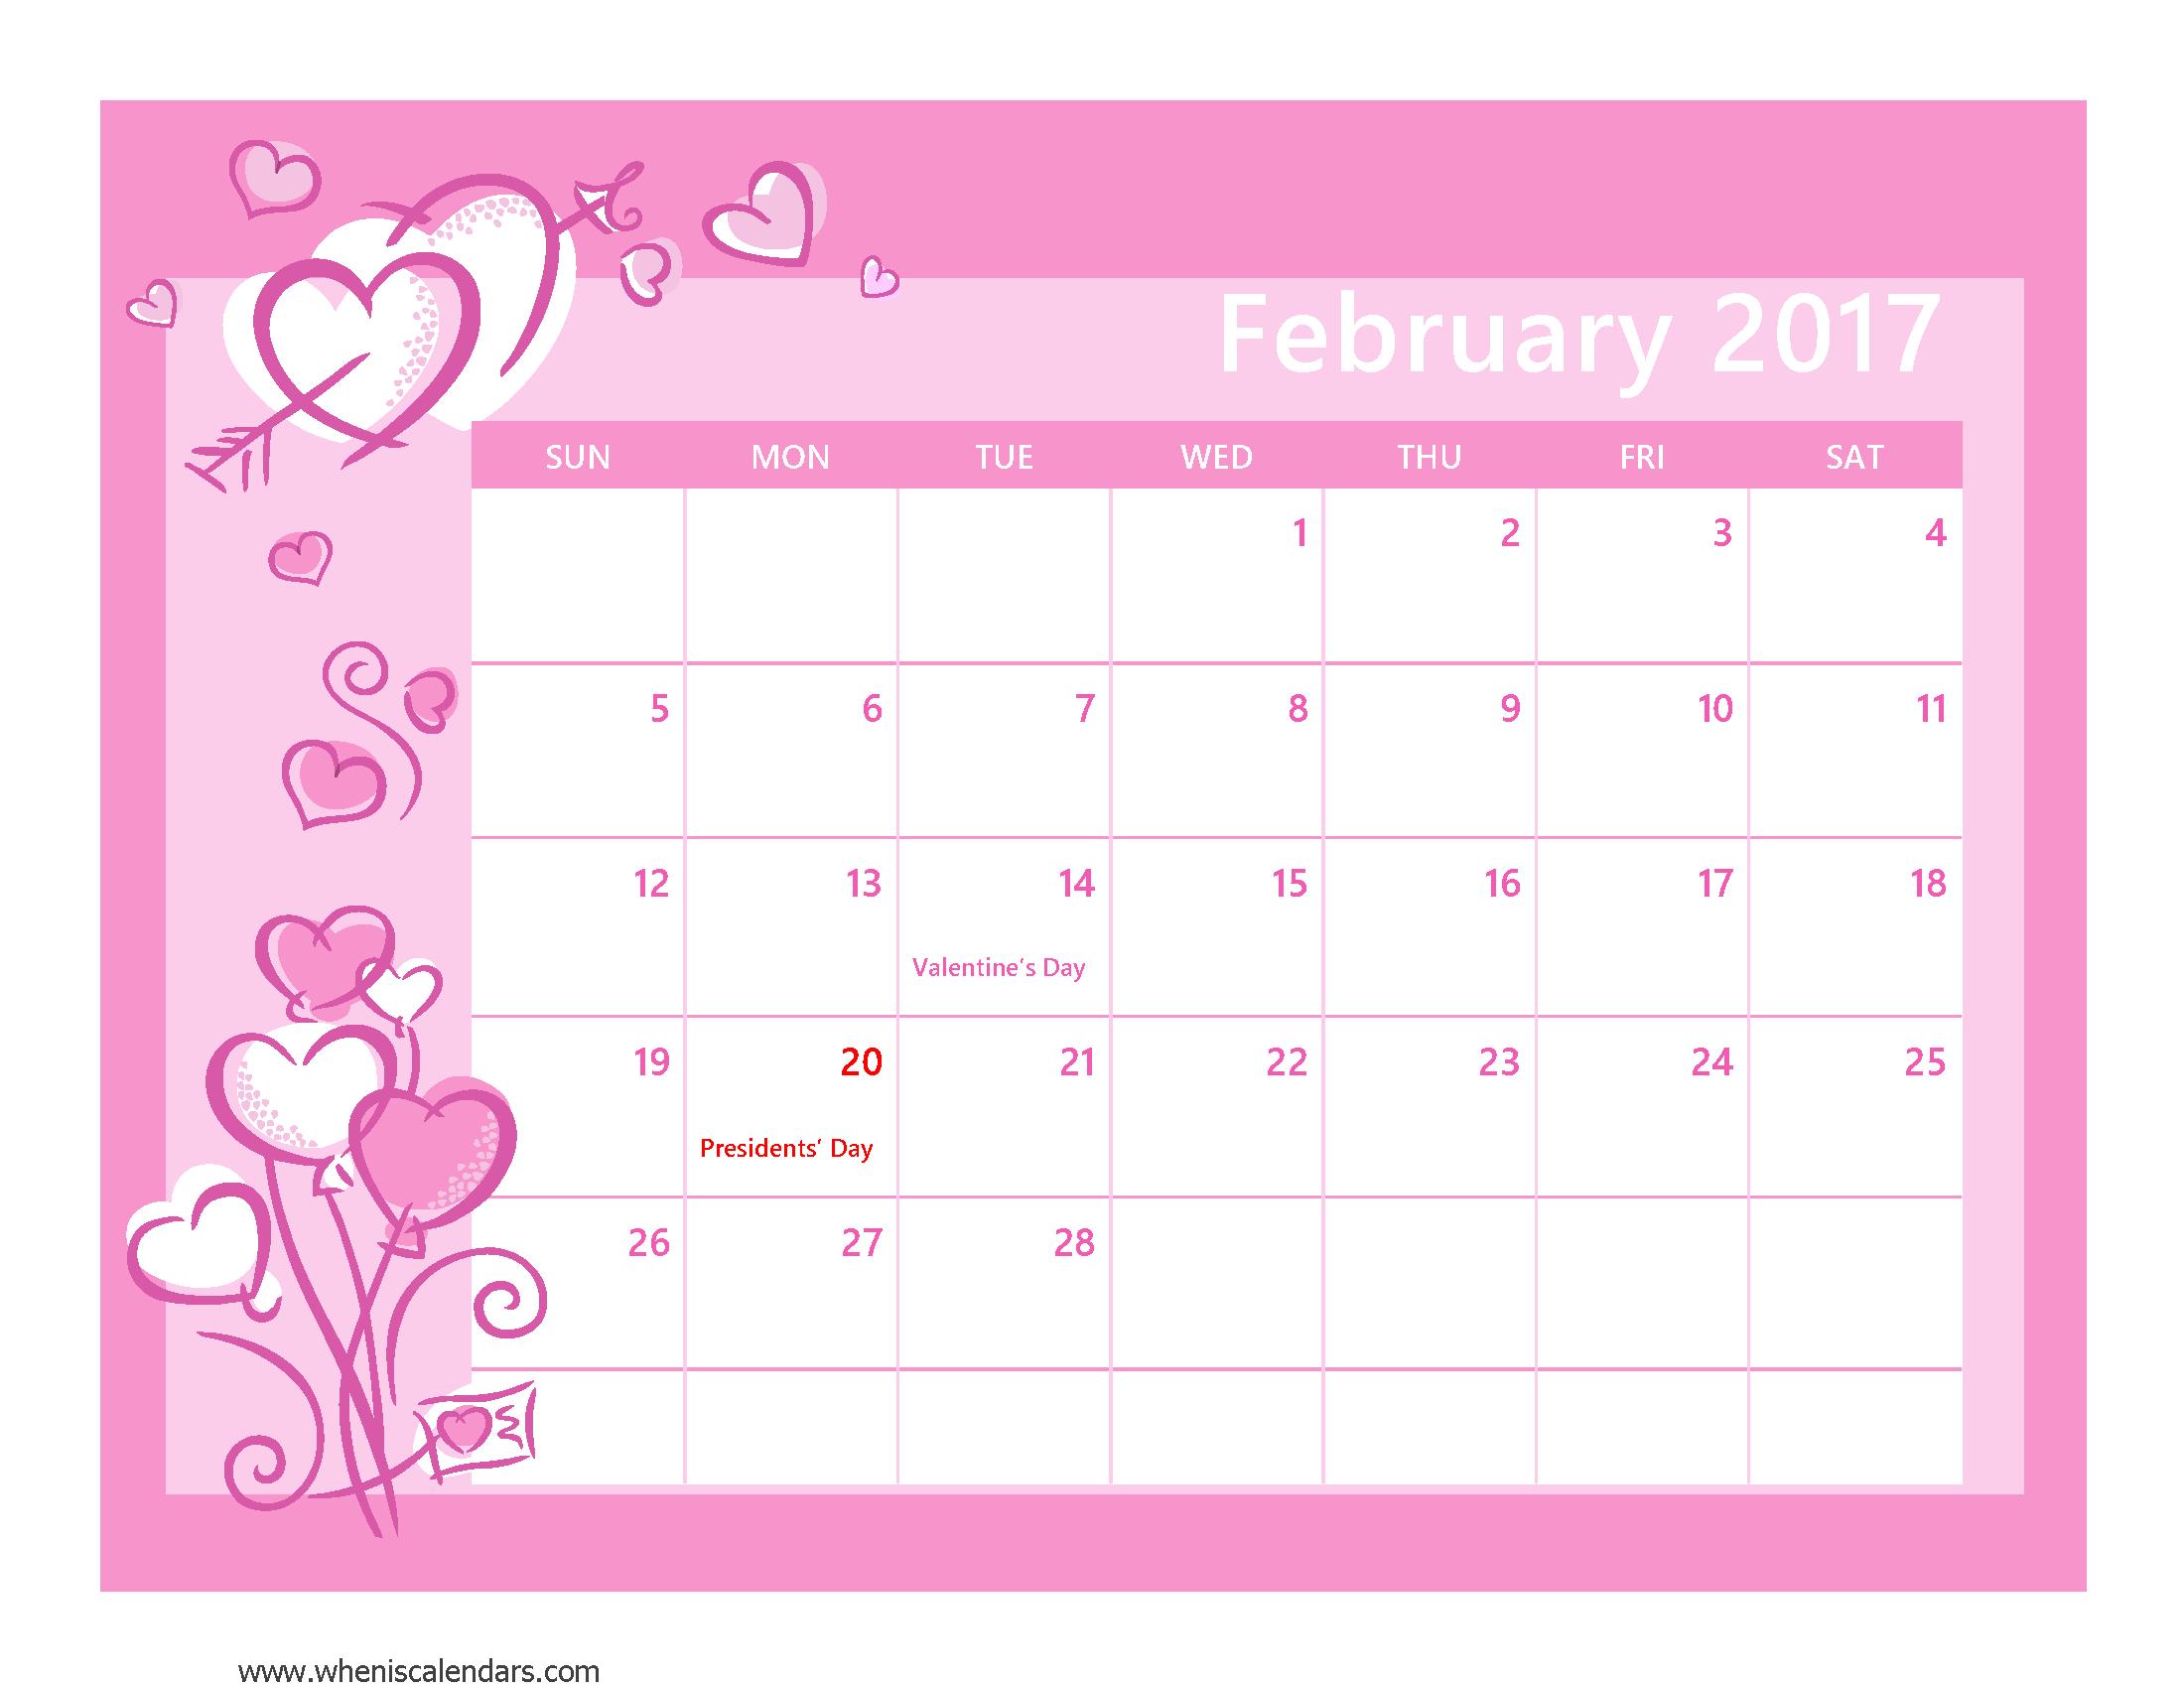 January Calendar Printable Org Calendar Printable With Holidays